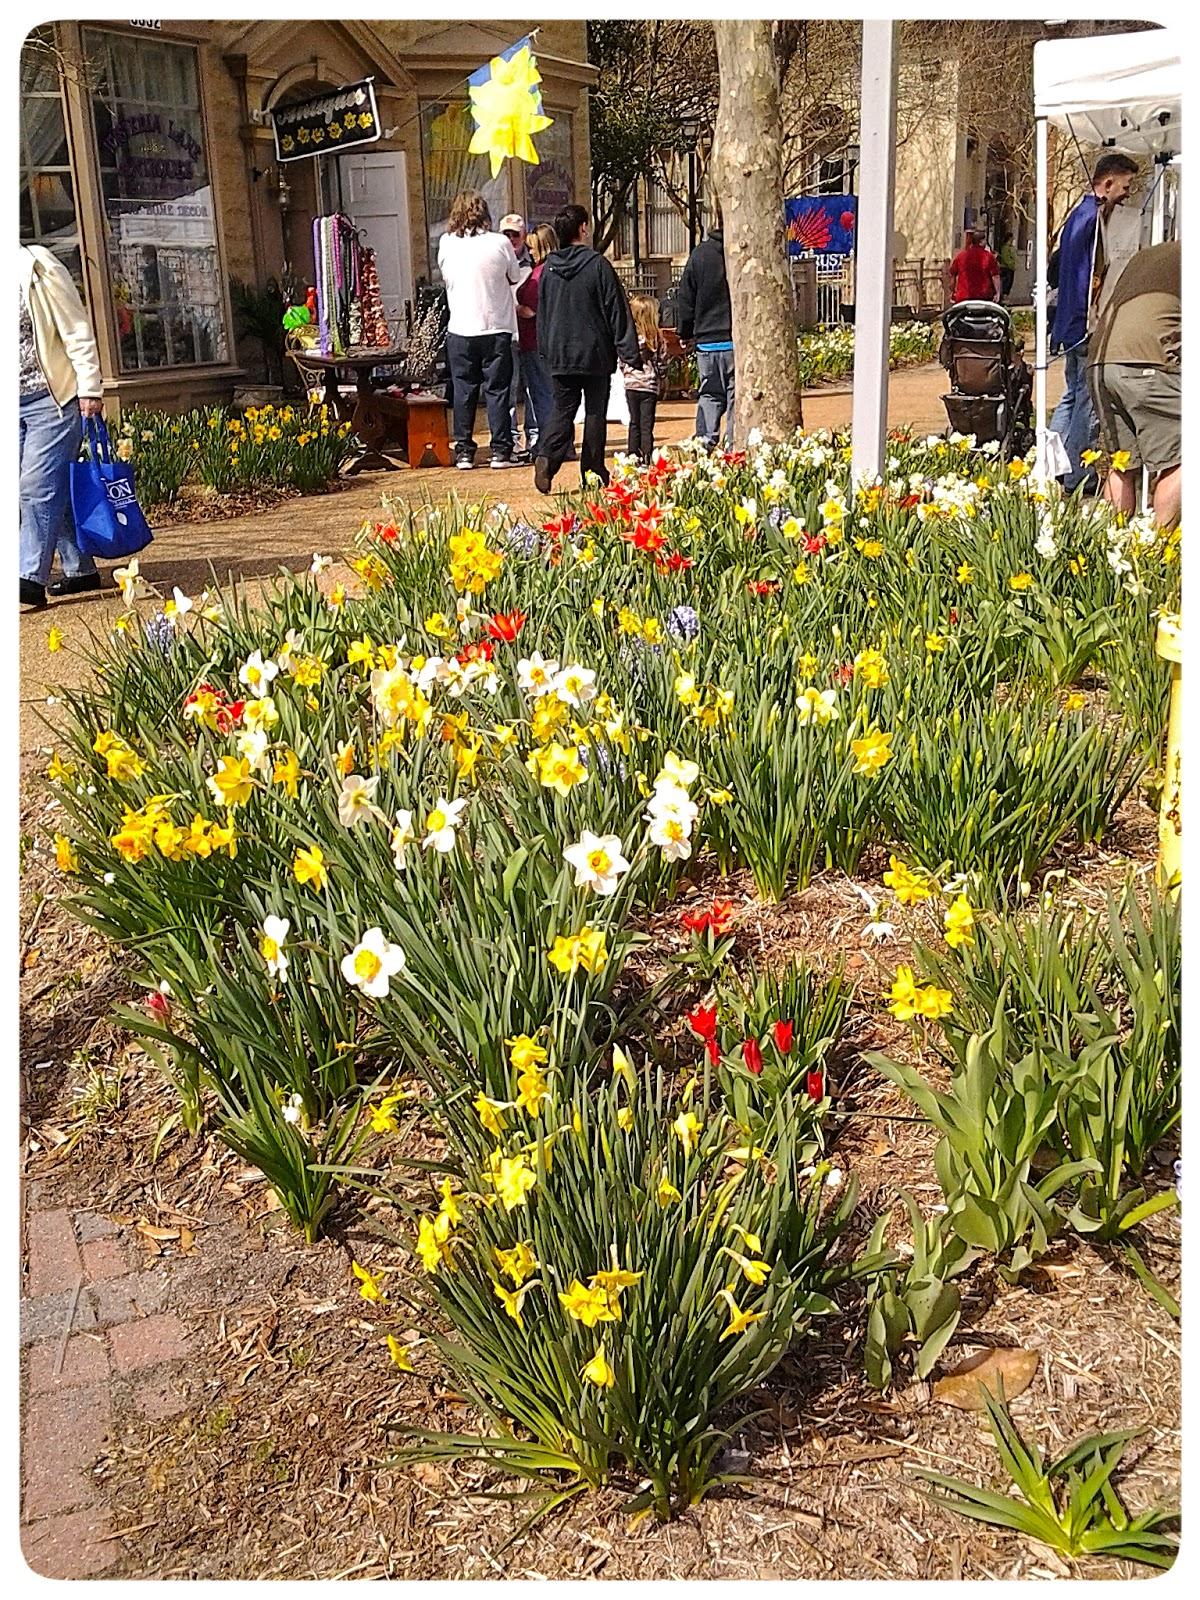 28th Annual Gloucester Daffodil Festival via foobella.blogspot.com